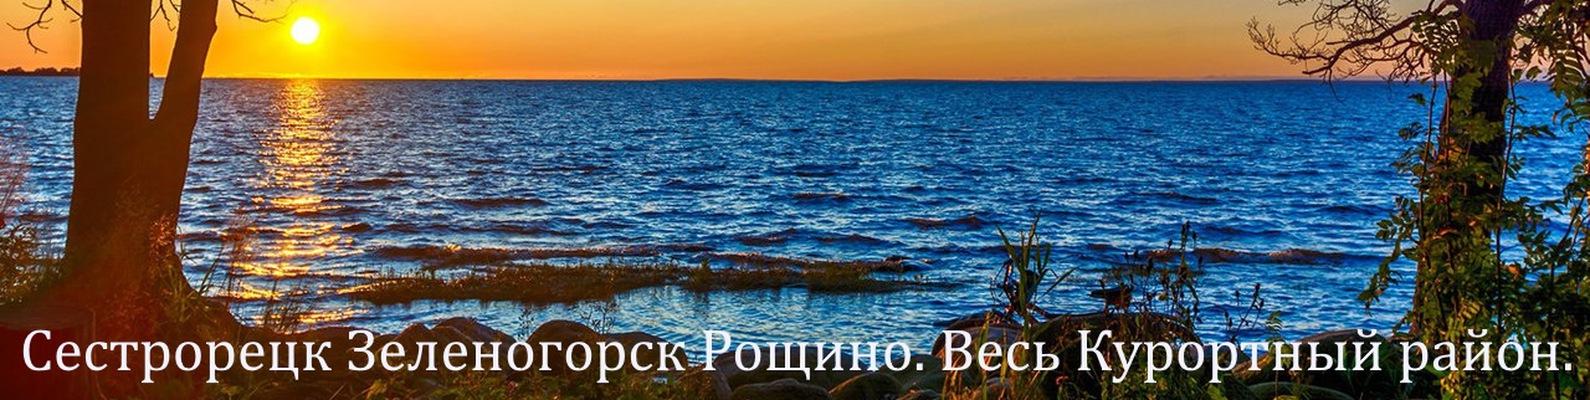 аренда авто без водителя спб приморский район